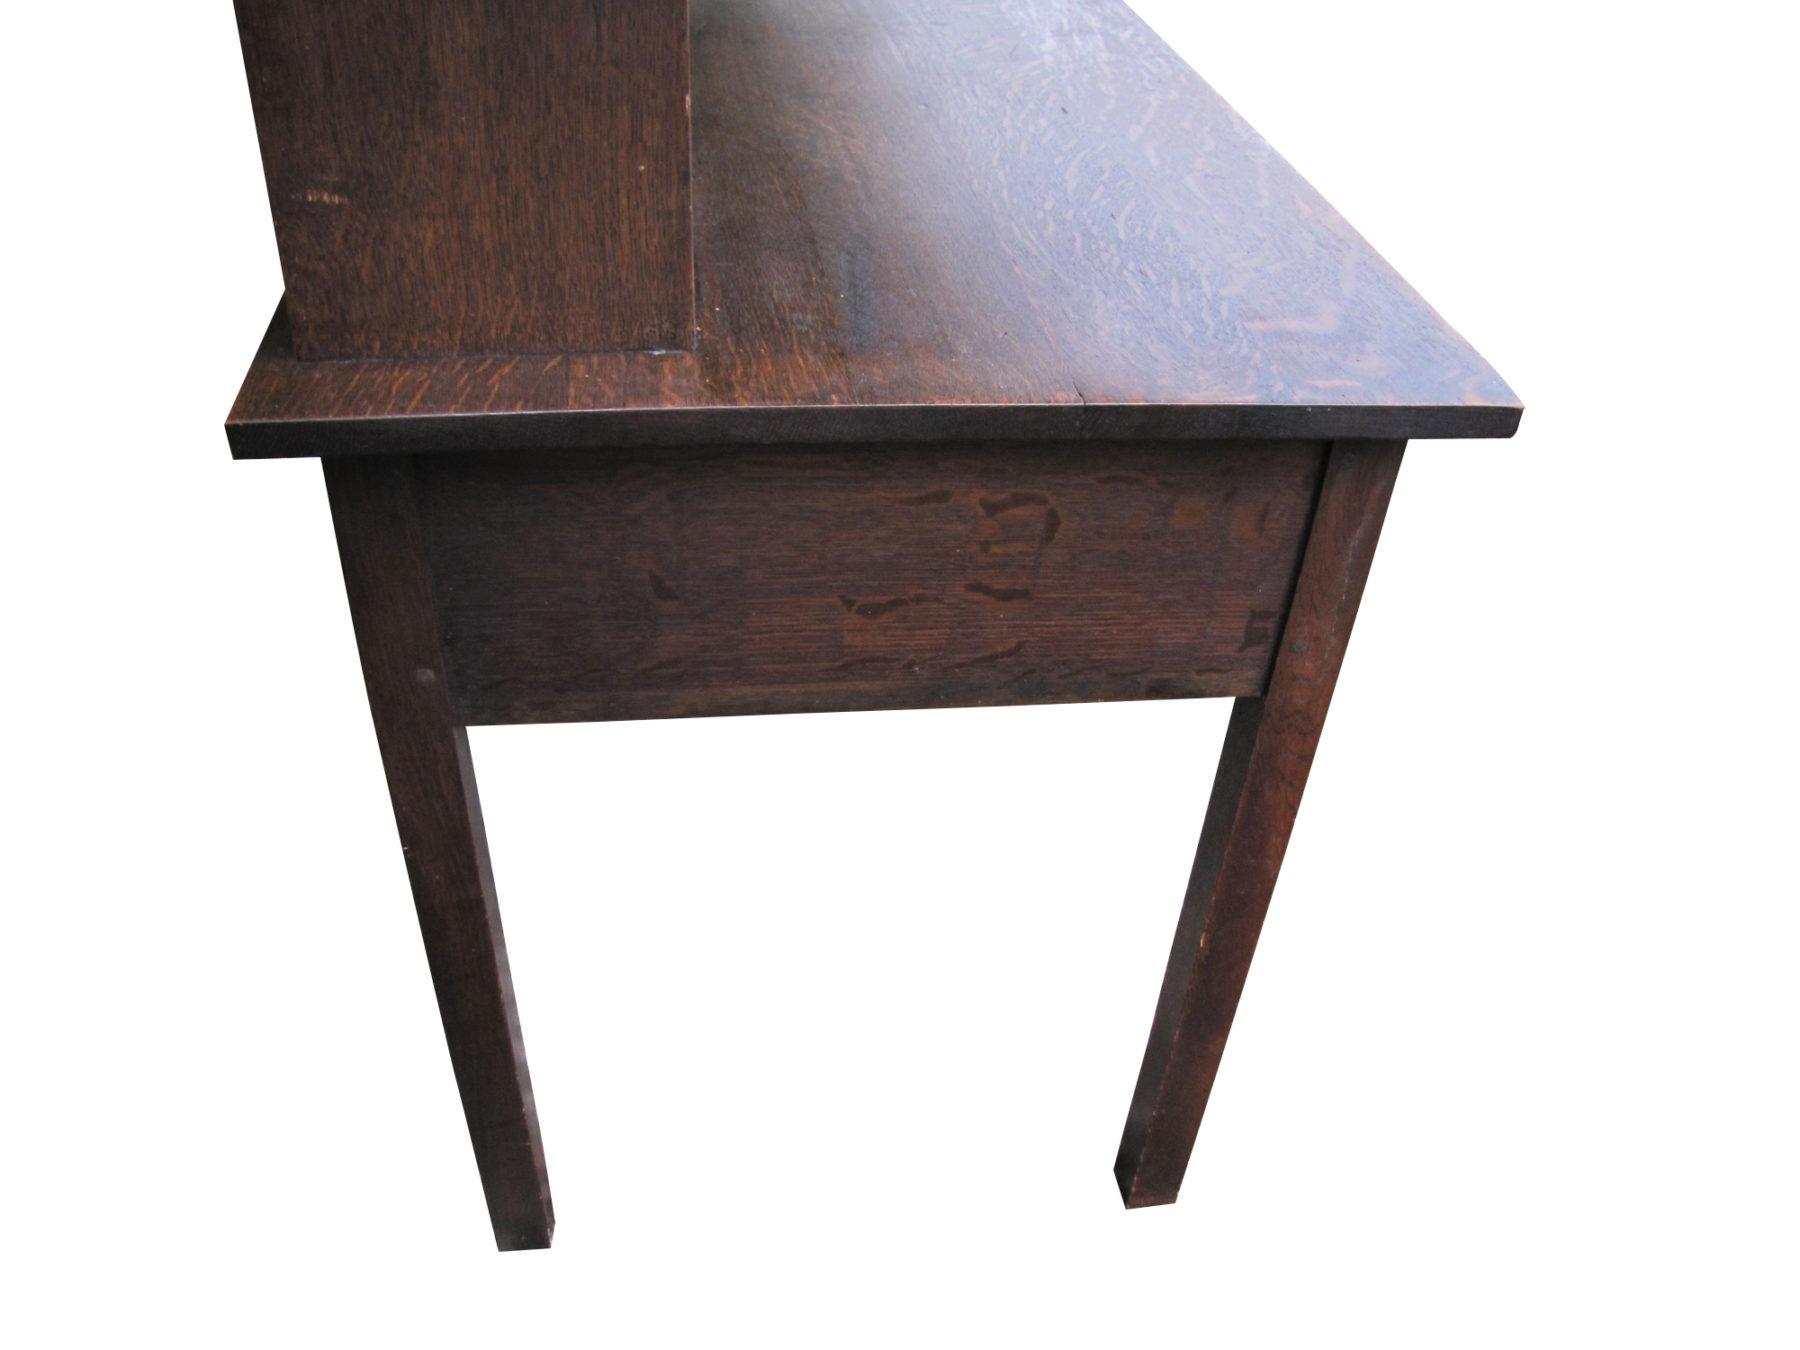 sideboards furniture craftsman interior oak voorhees of latest regarding strap gustav sideboard desk view mission stickley